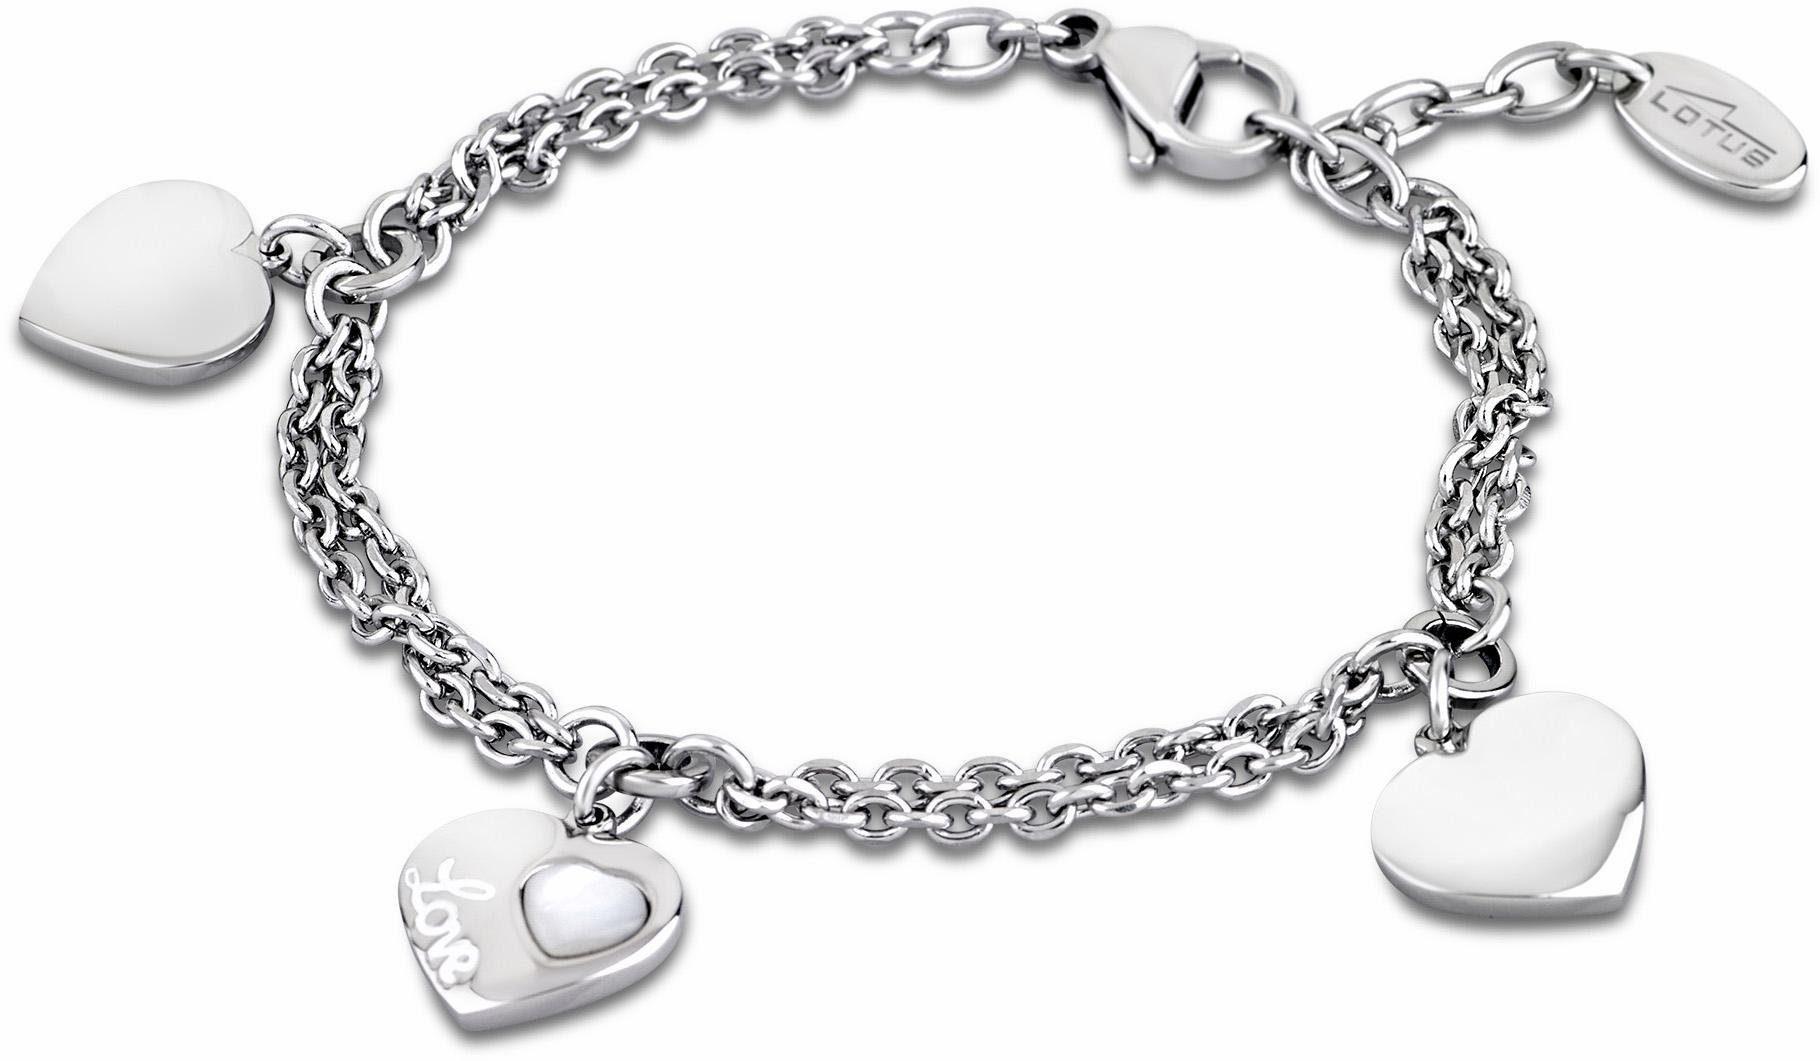 Lotus Style Armband »Armband, Woman´s Heart, LS1748-2/1«, mit Perlmutteinlage